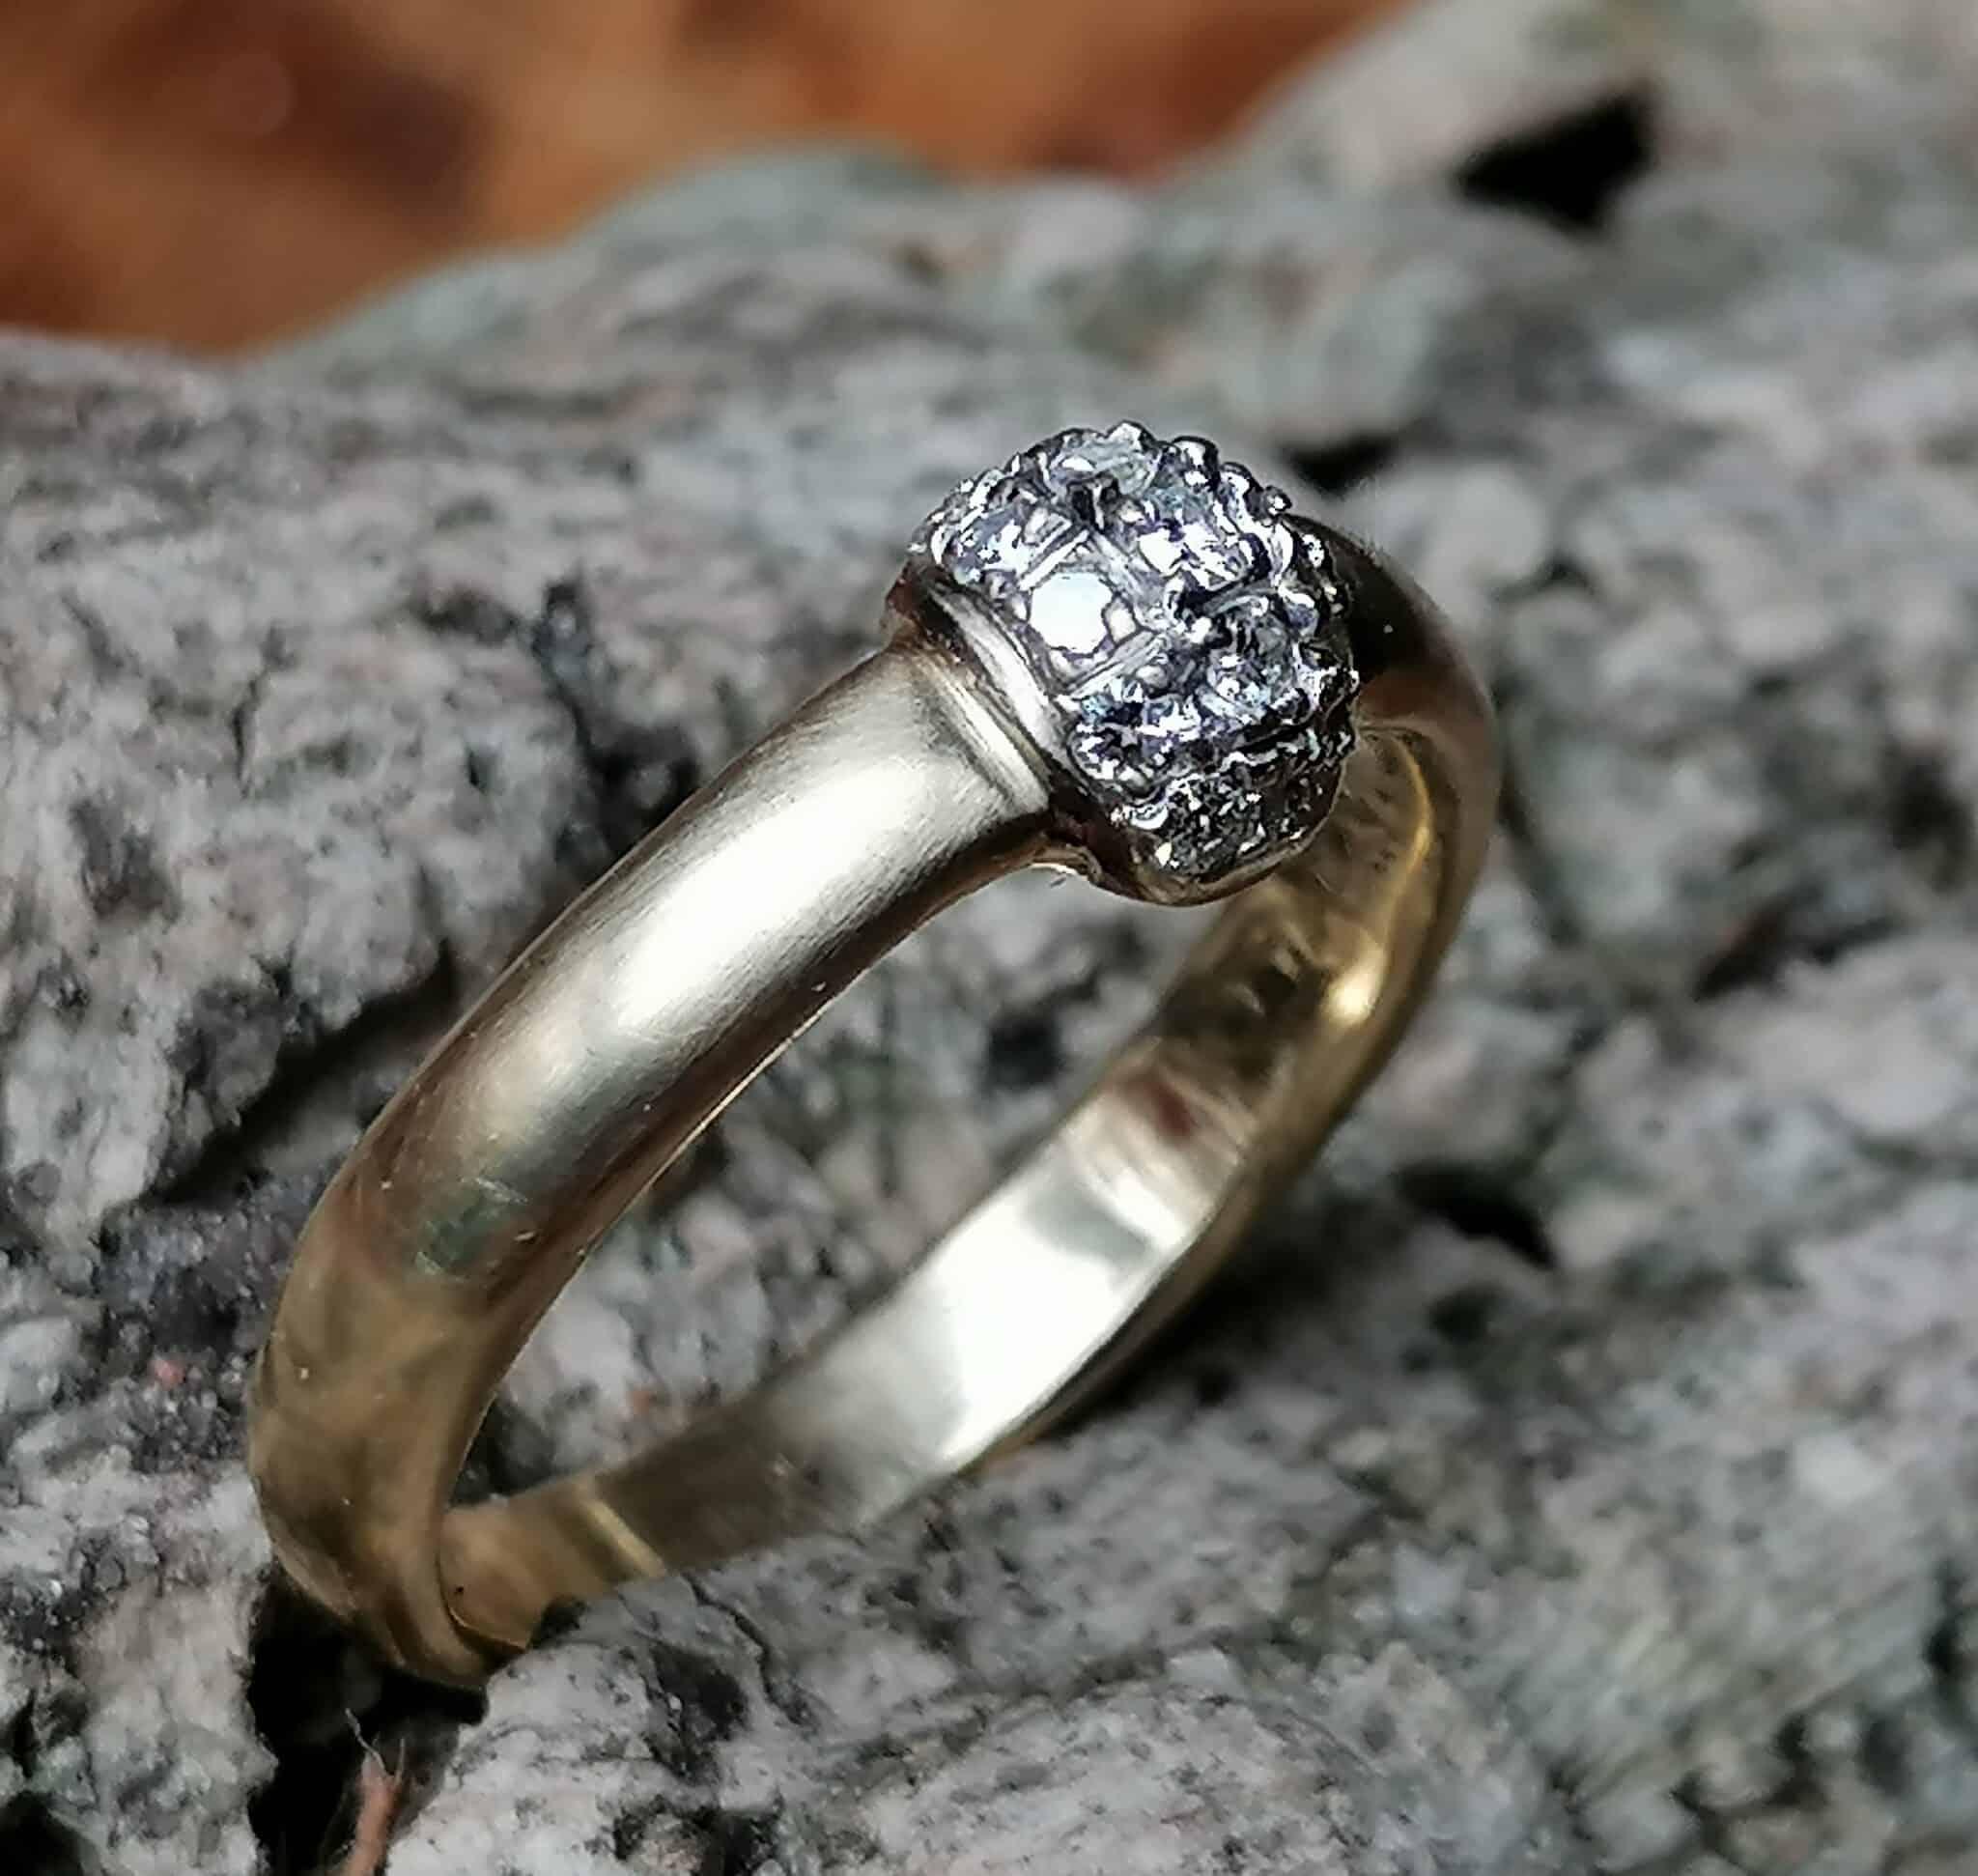 Unikat Ring 13 Brillanten 0,4 ct vs Gold 585 Weißgold 585 Ringröße 55/17,5